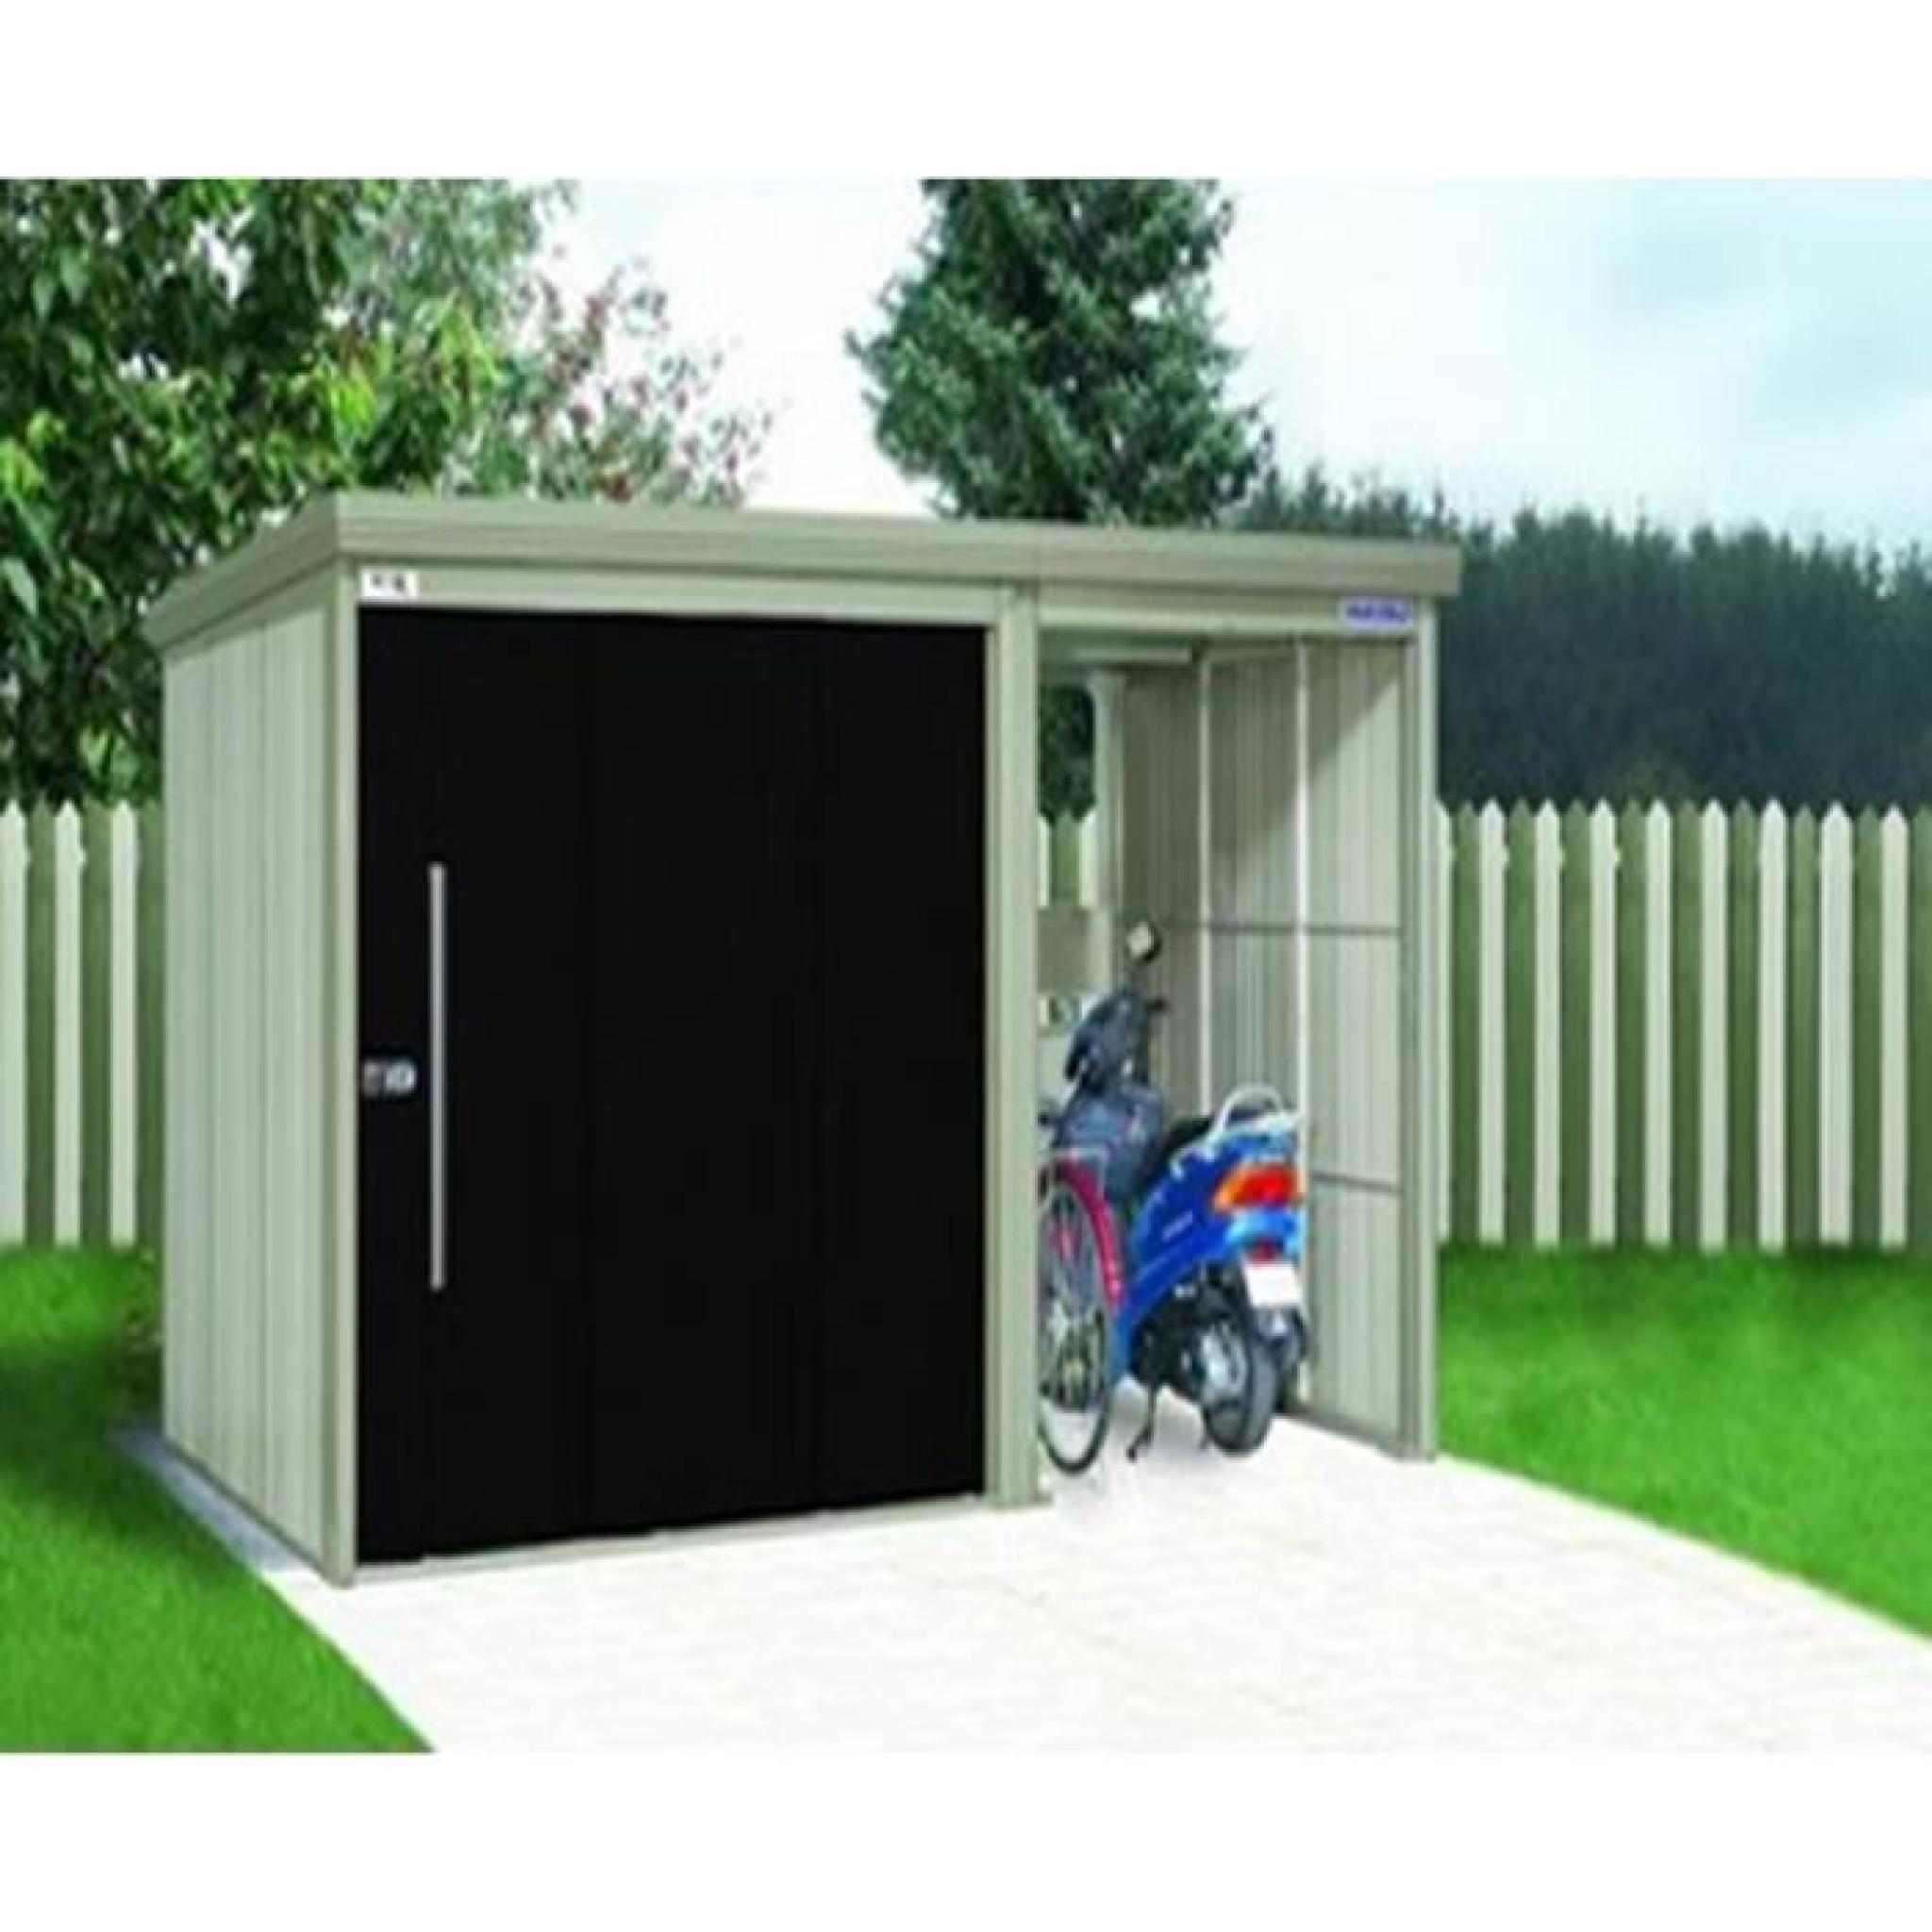 Abri de jardin en acier galvanis avec portes noires 382 for Abri de jardin acier